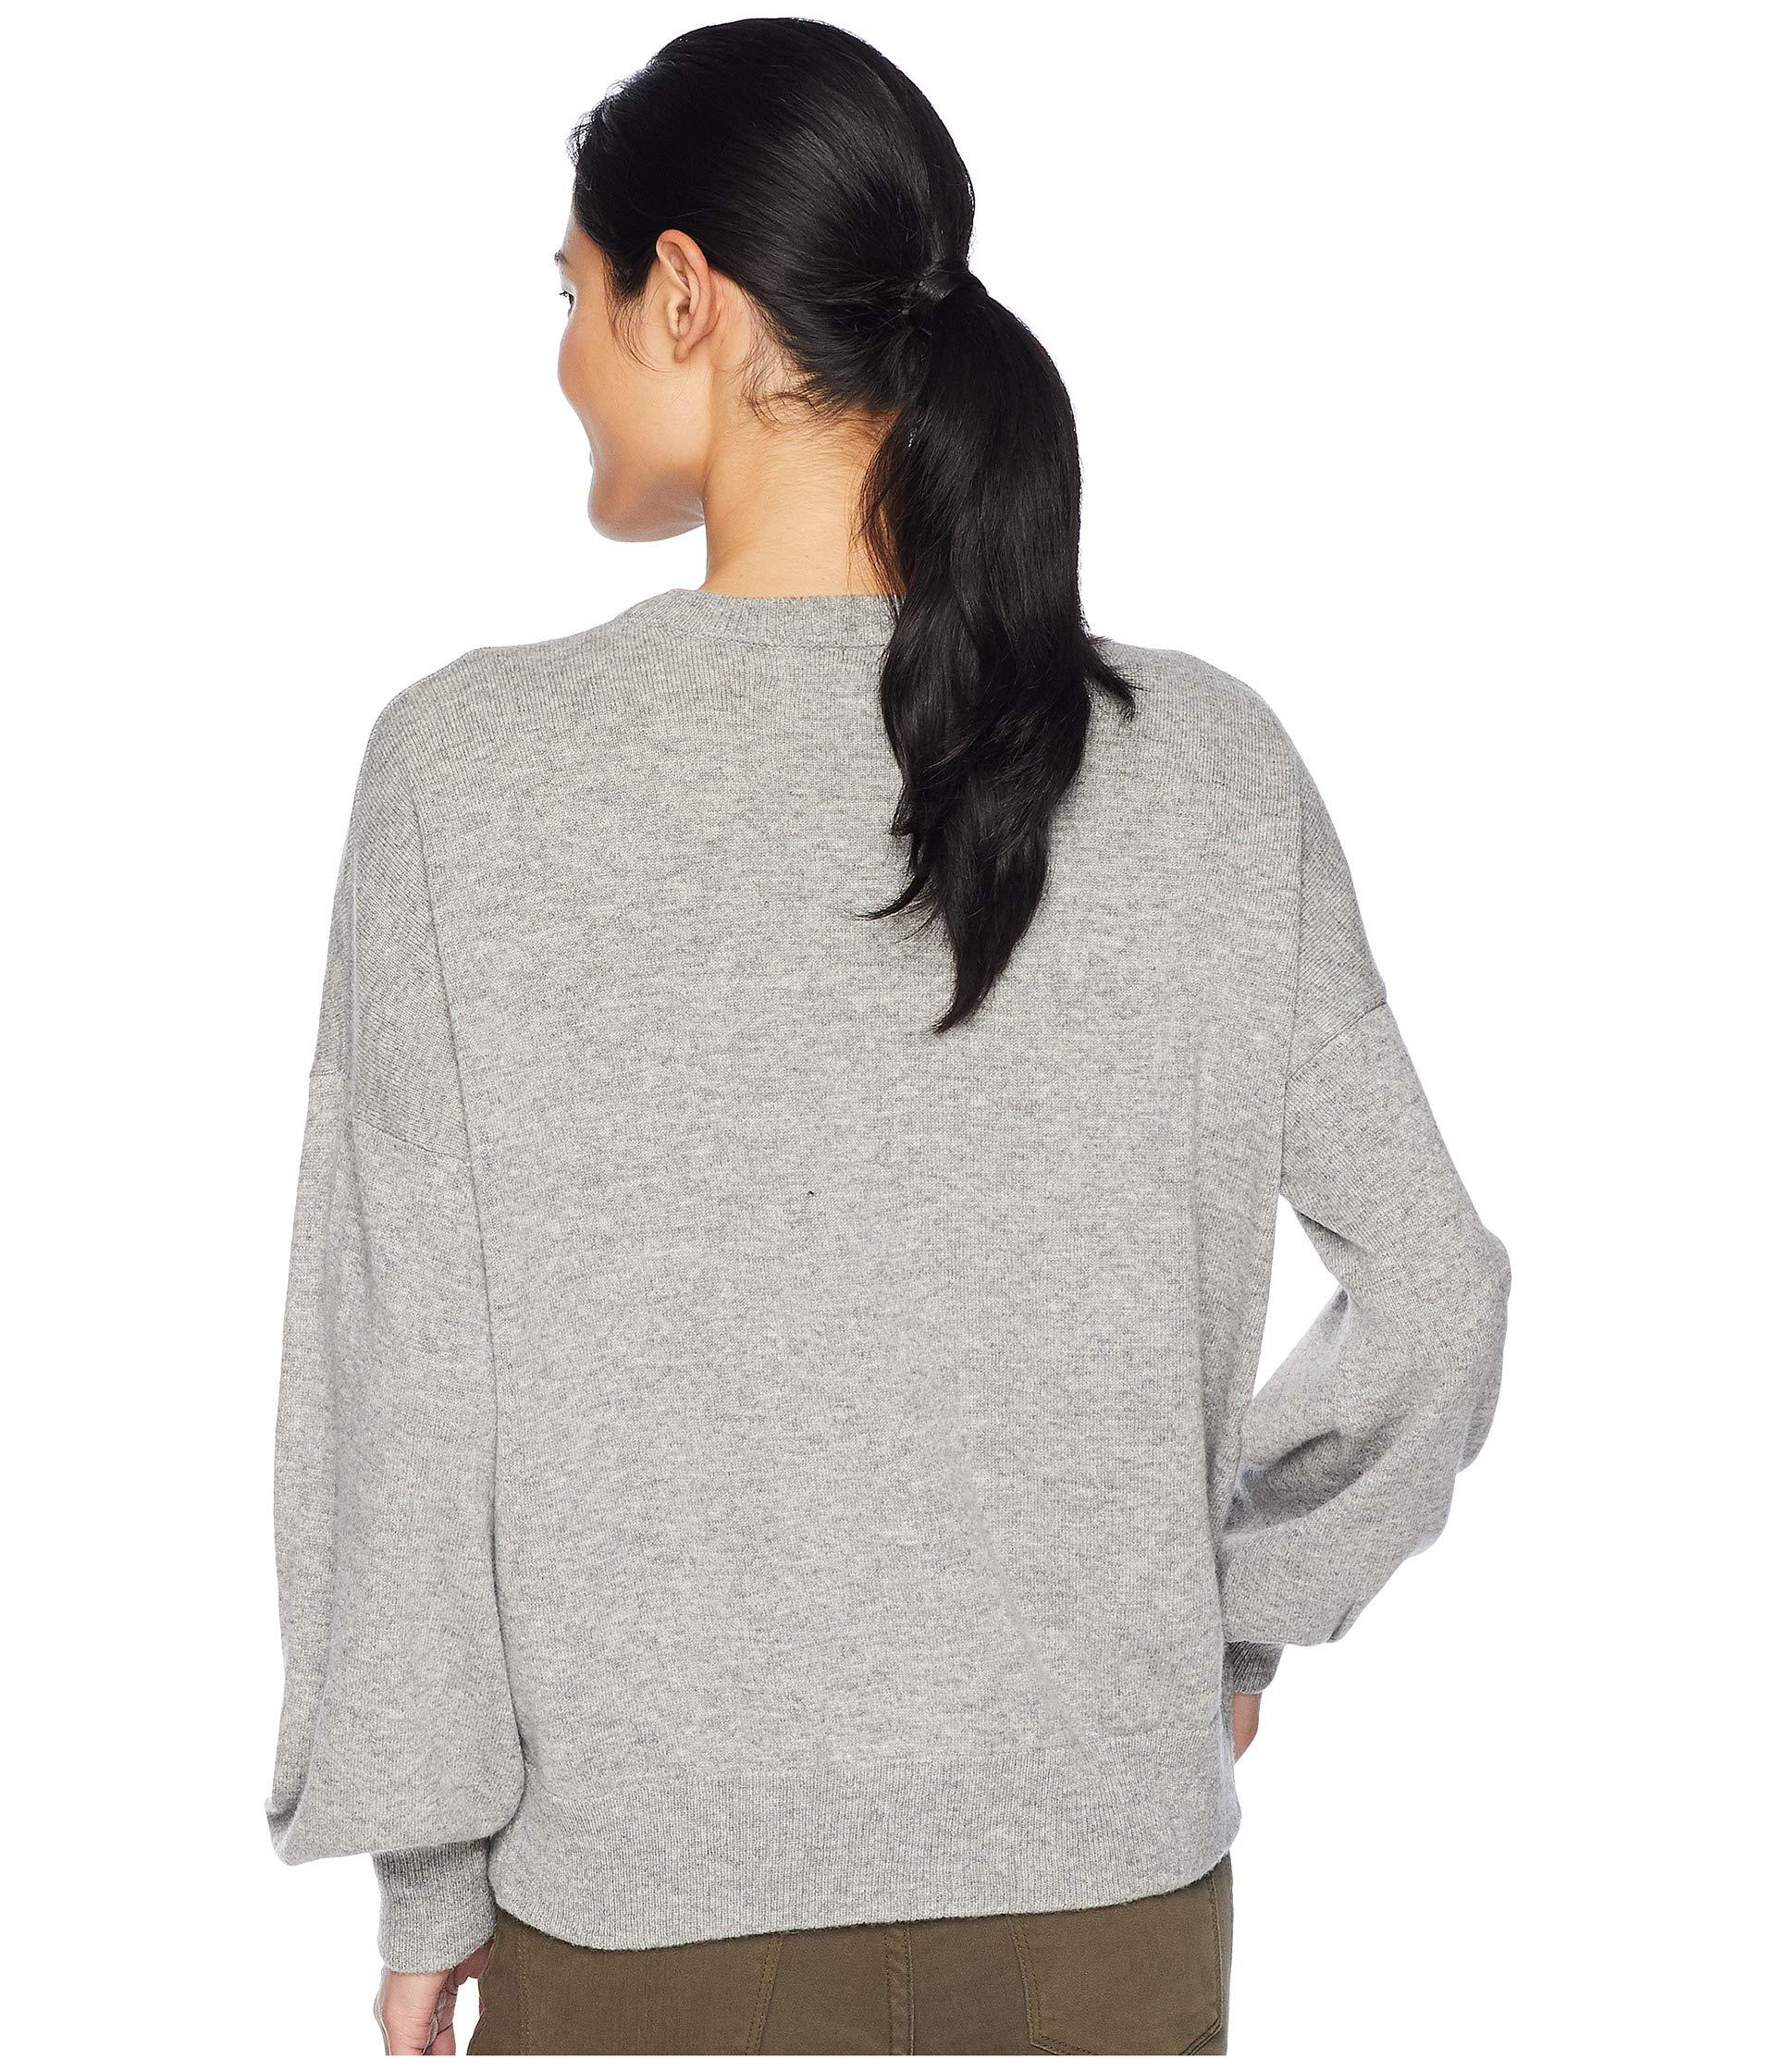 Gangster Heather Grey Spiritual Medium Sg Sig Sweater 8nBCq